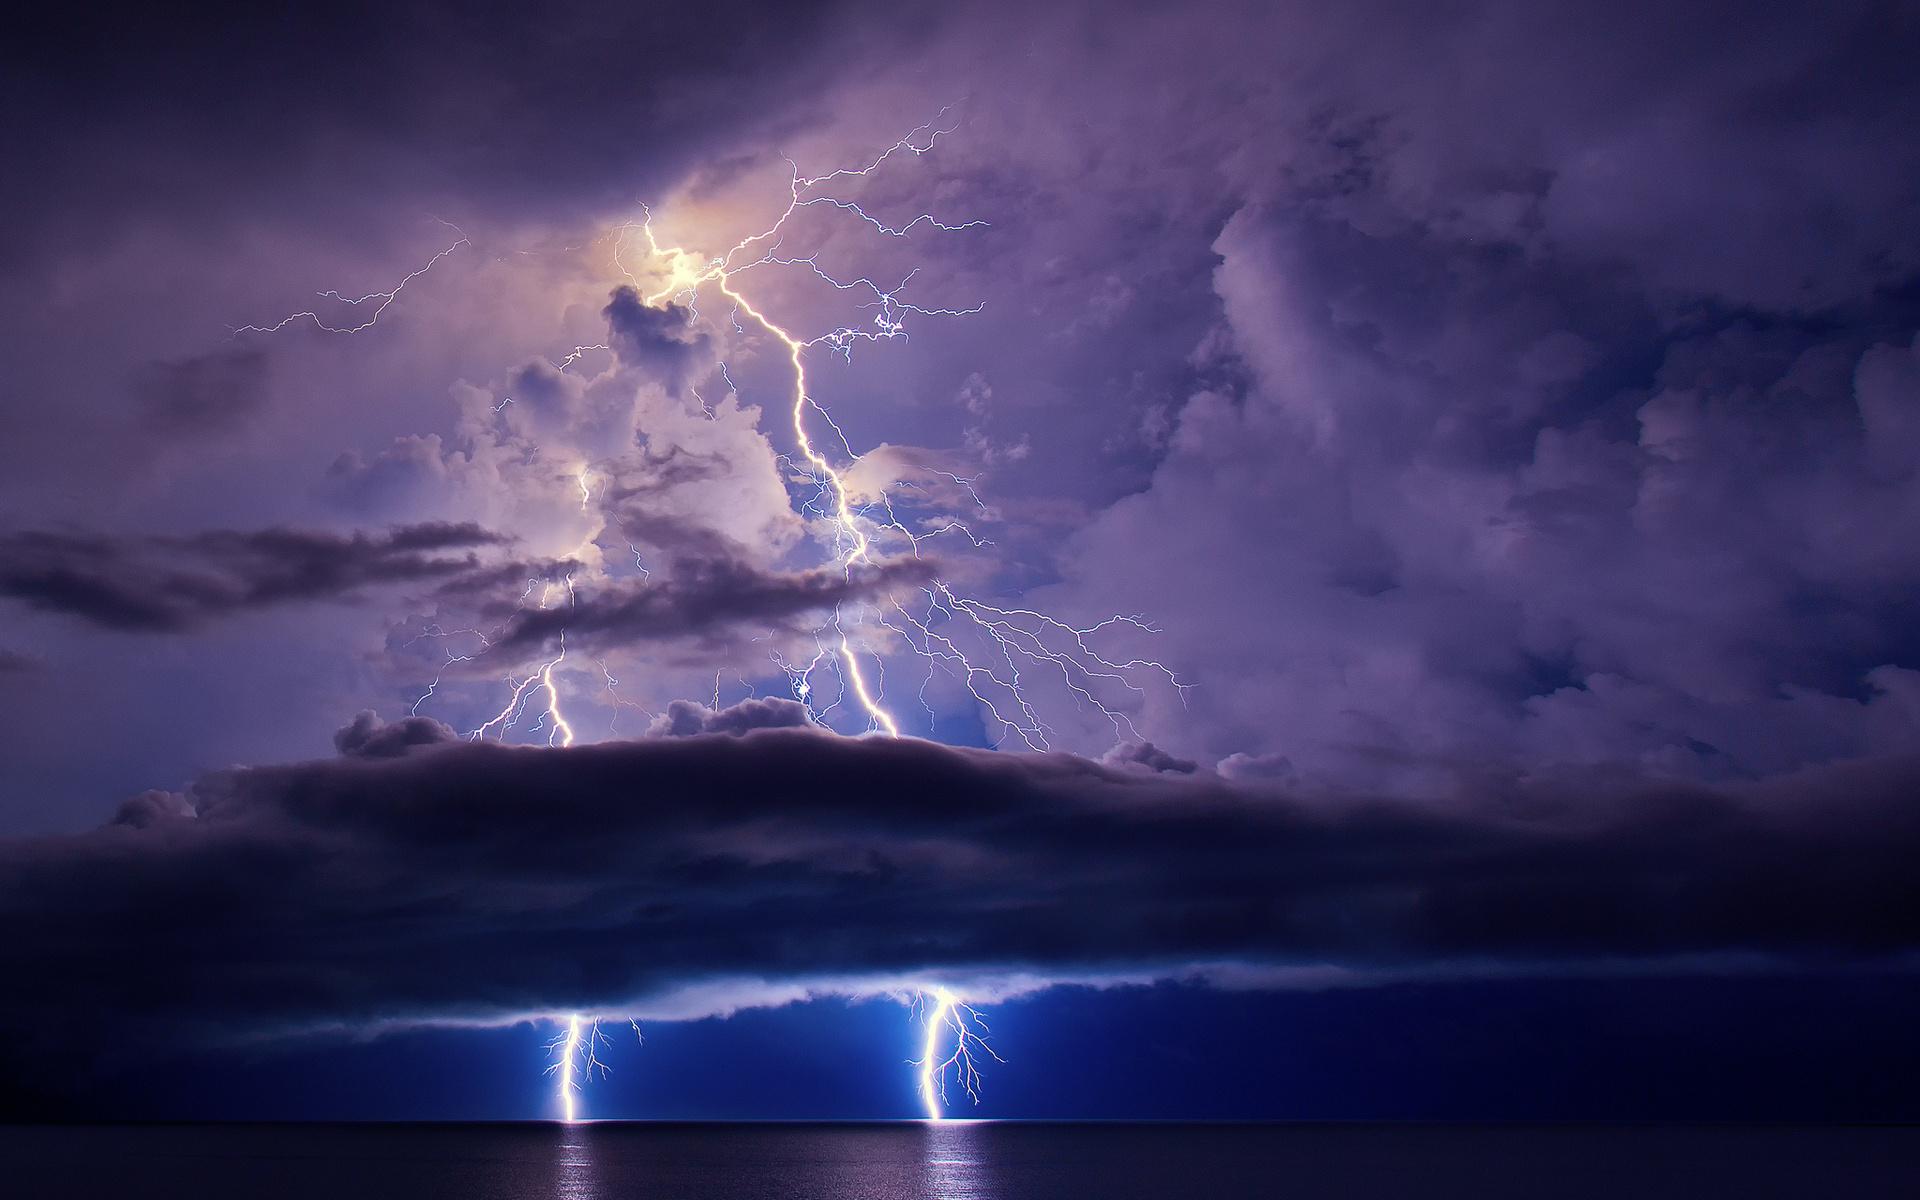 Синяя буря картинки